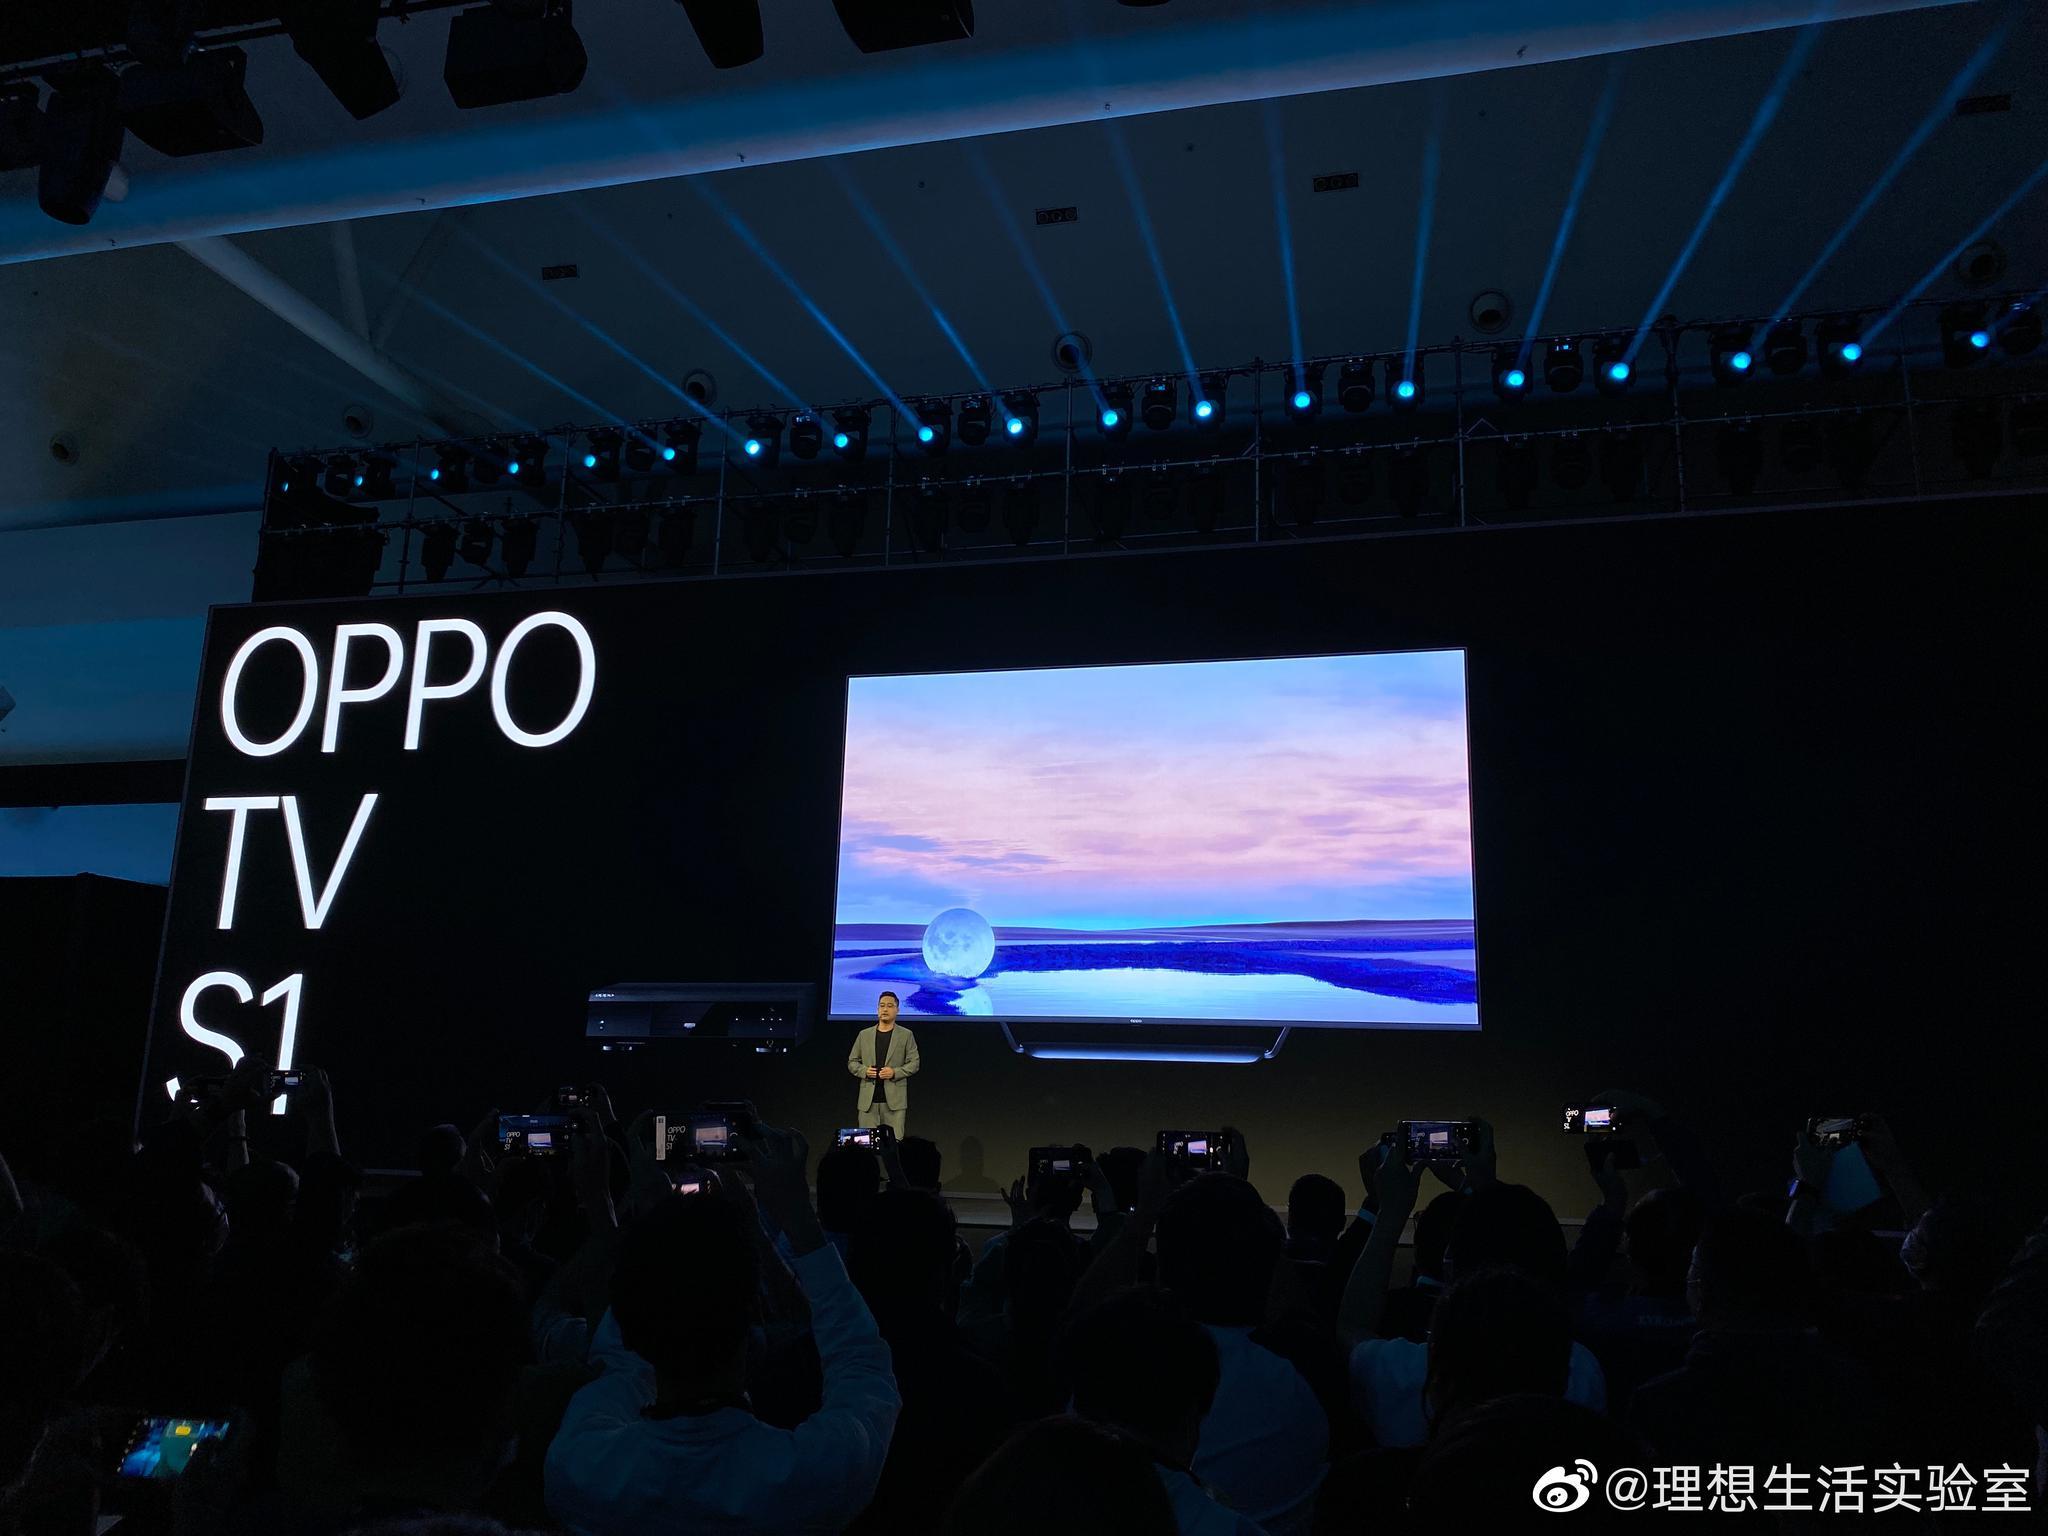 OPPO 正式发布智能电视 OPPO TV S1。量子点 QLED 屏,10.7 亿色